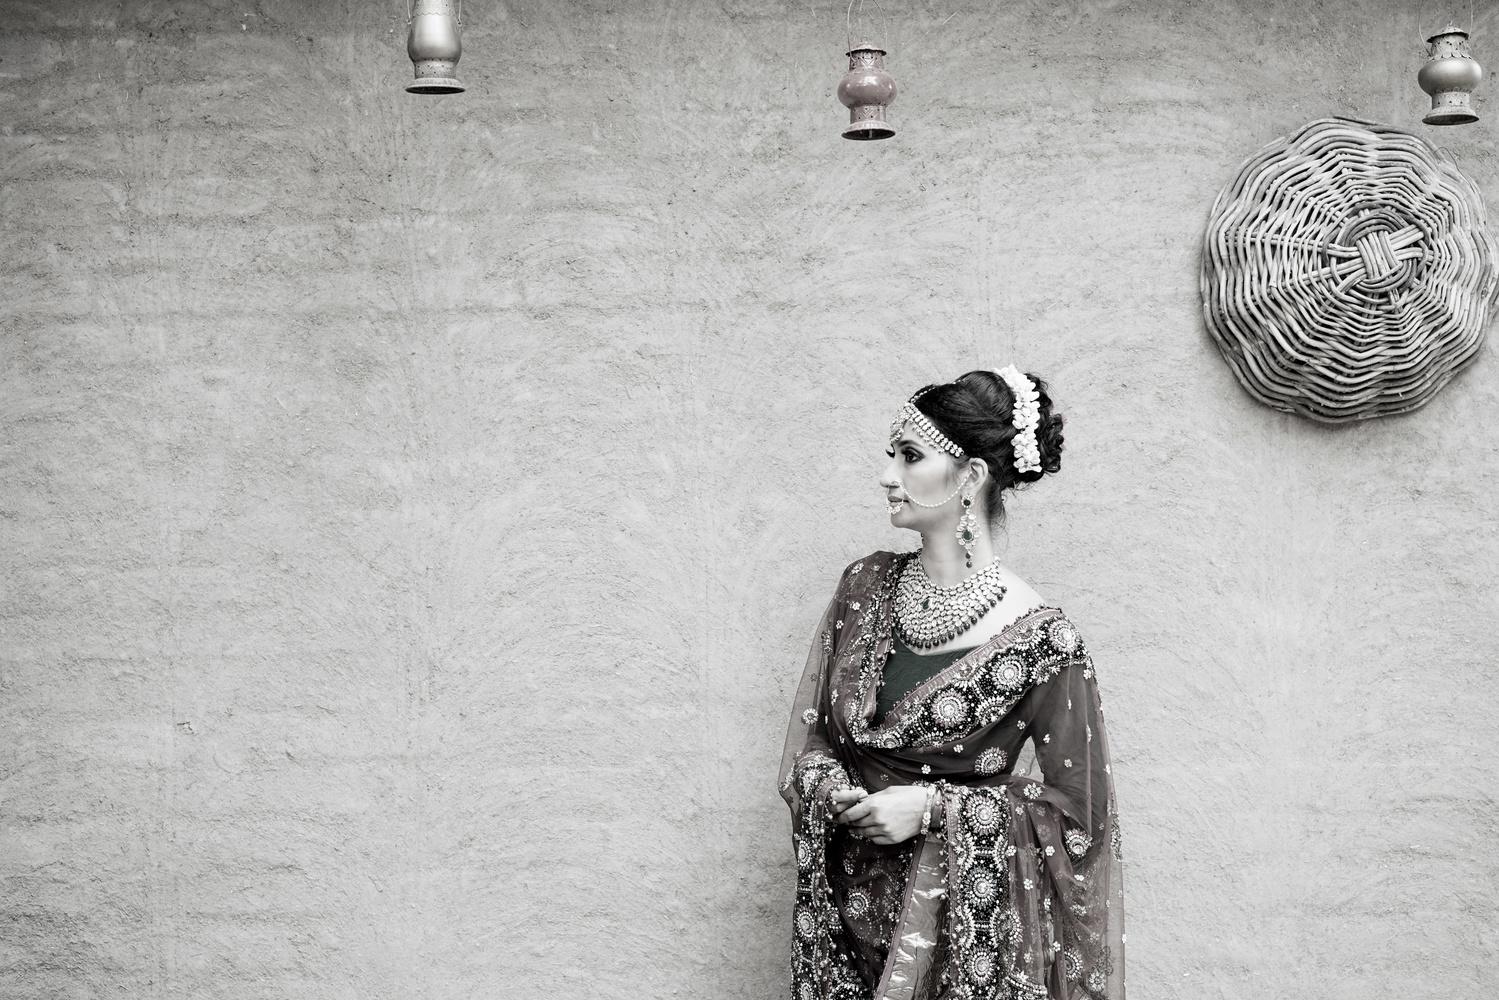 Bridal Portrait Delhi Wedding Photography by sandeep kashyap